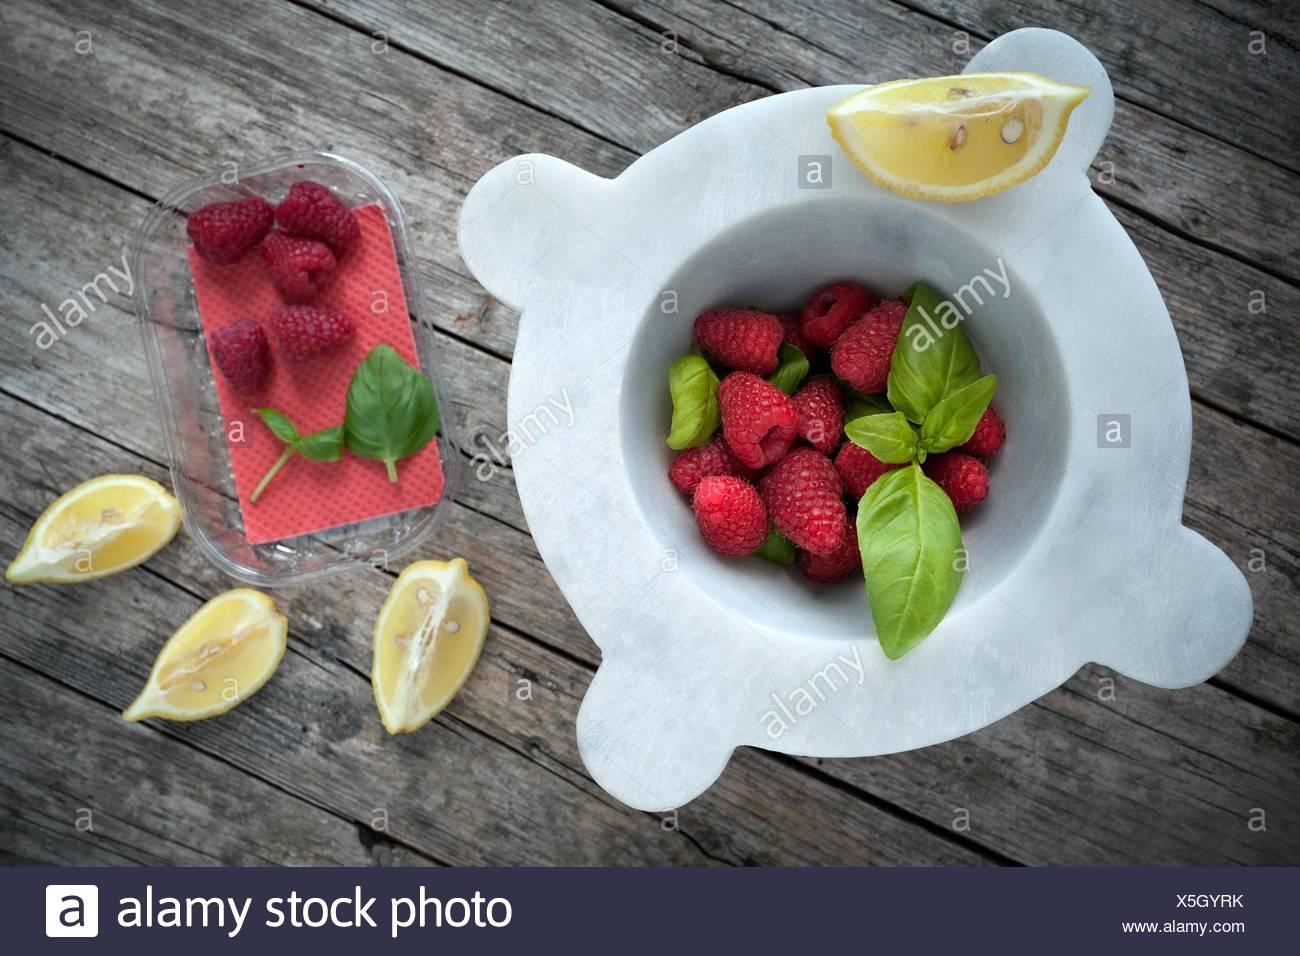 Mortar with fresh raspberries, basil leaves and lemon slices, above shot. - Stock Image